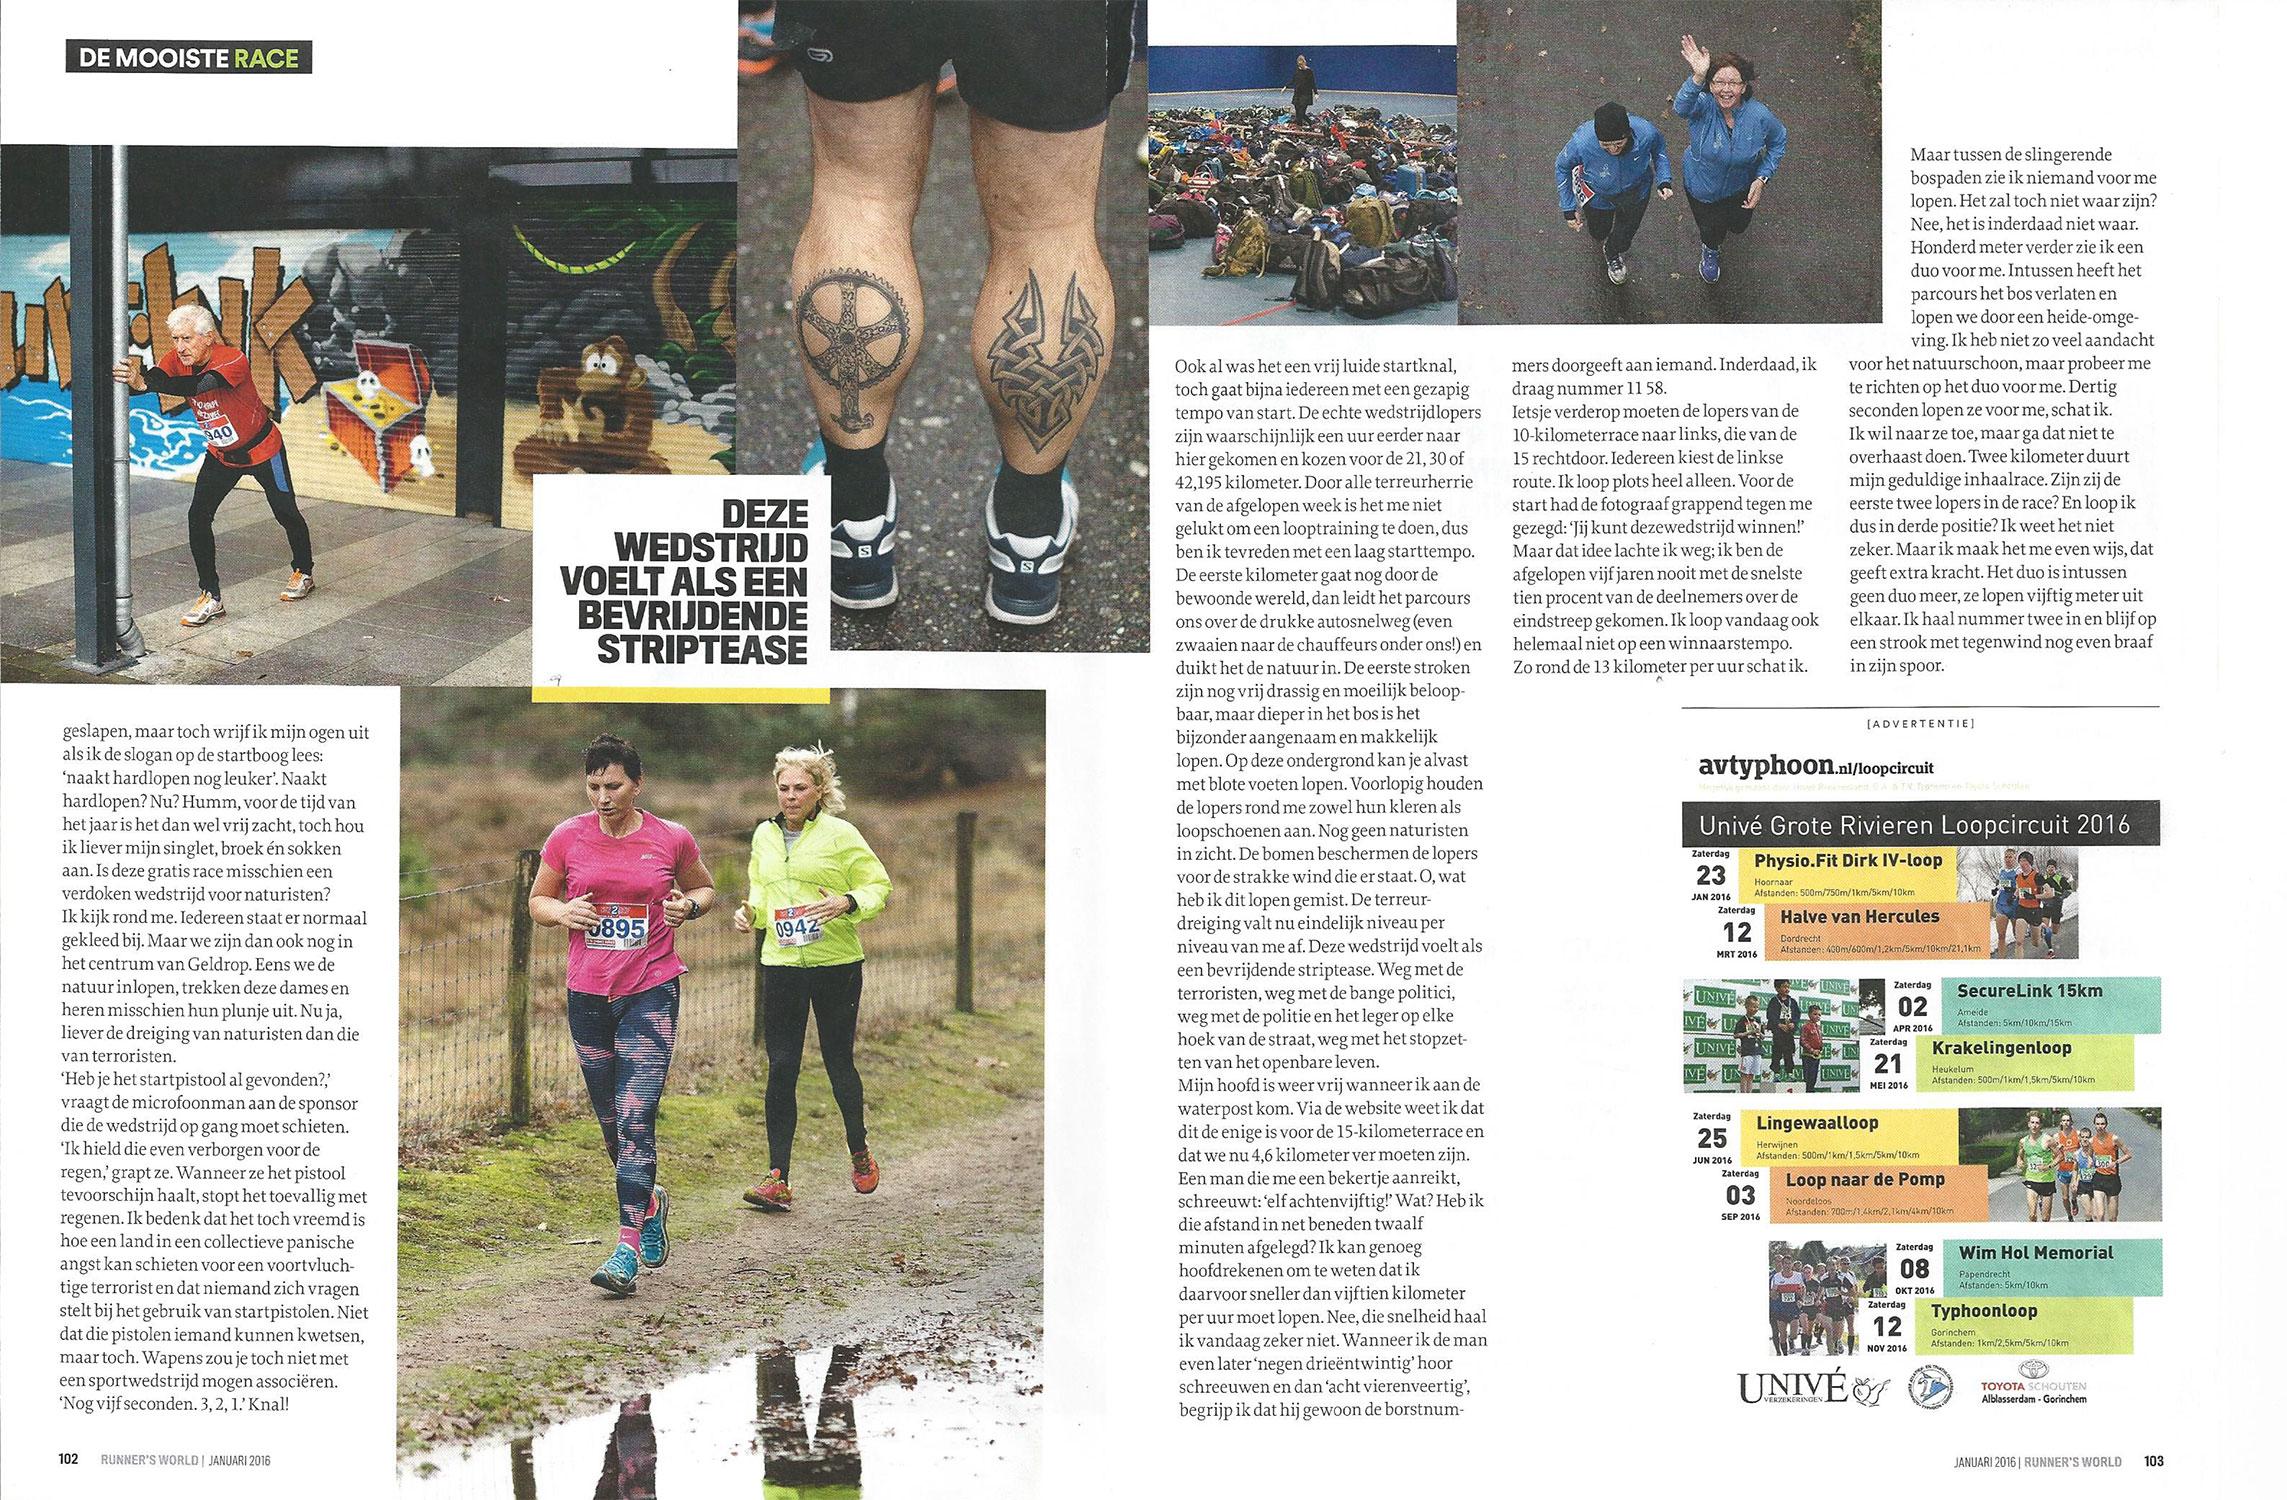 Artikel Runnersworld 2016 - Pagina 3/4